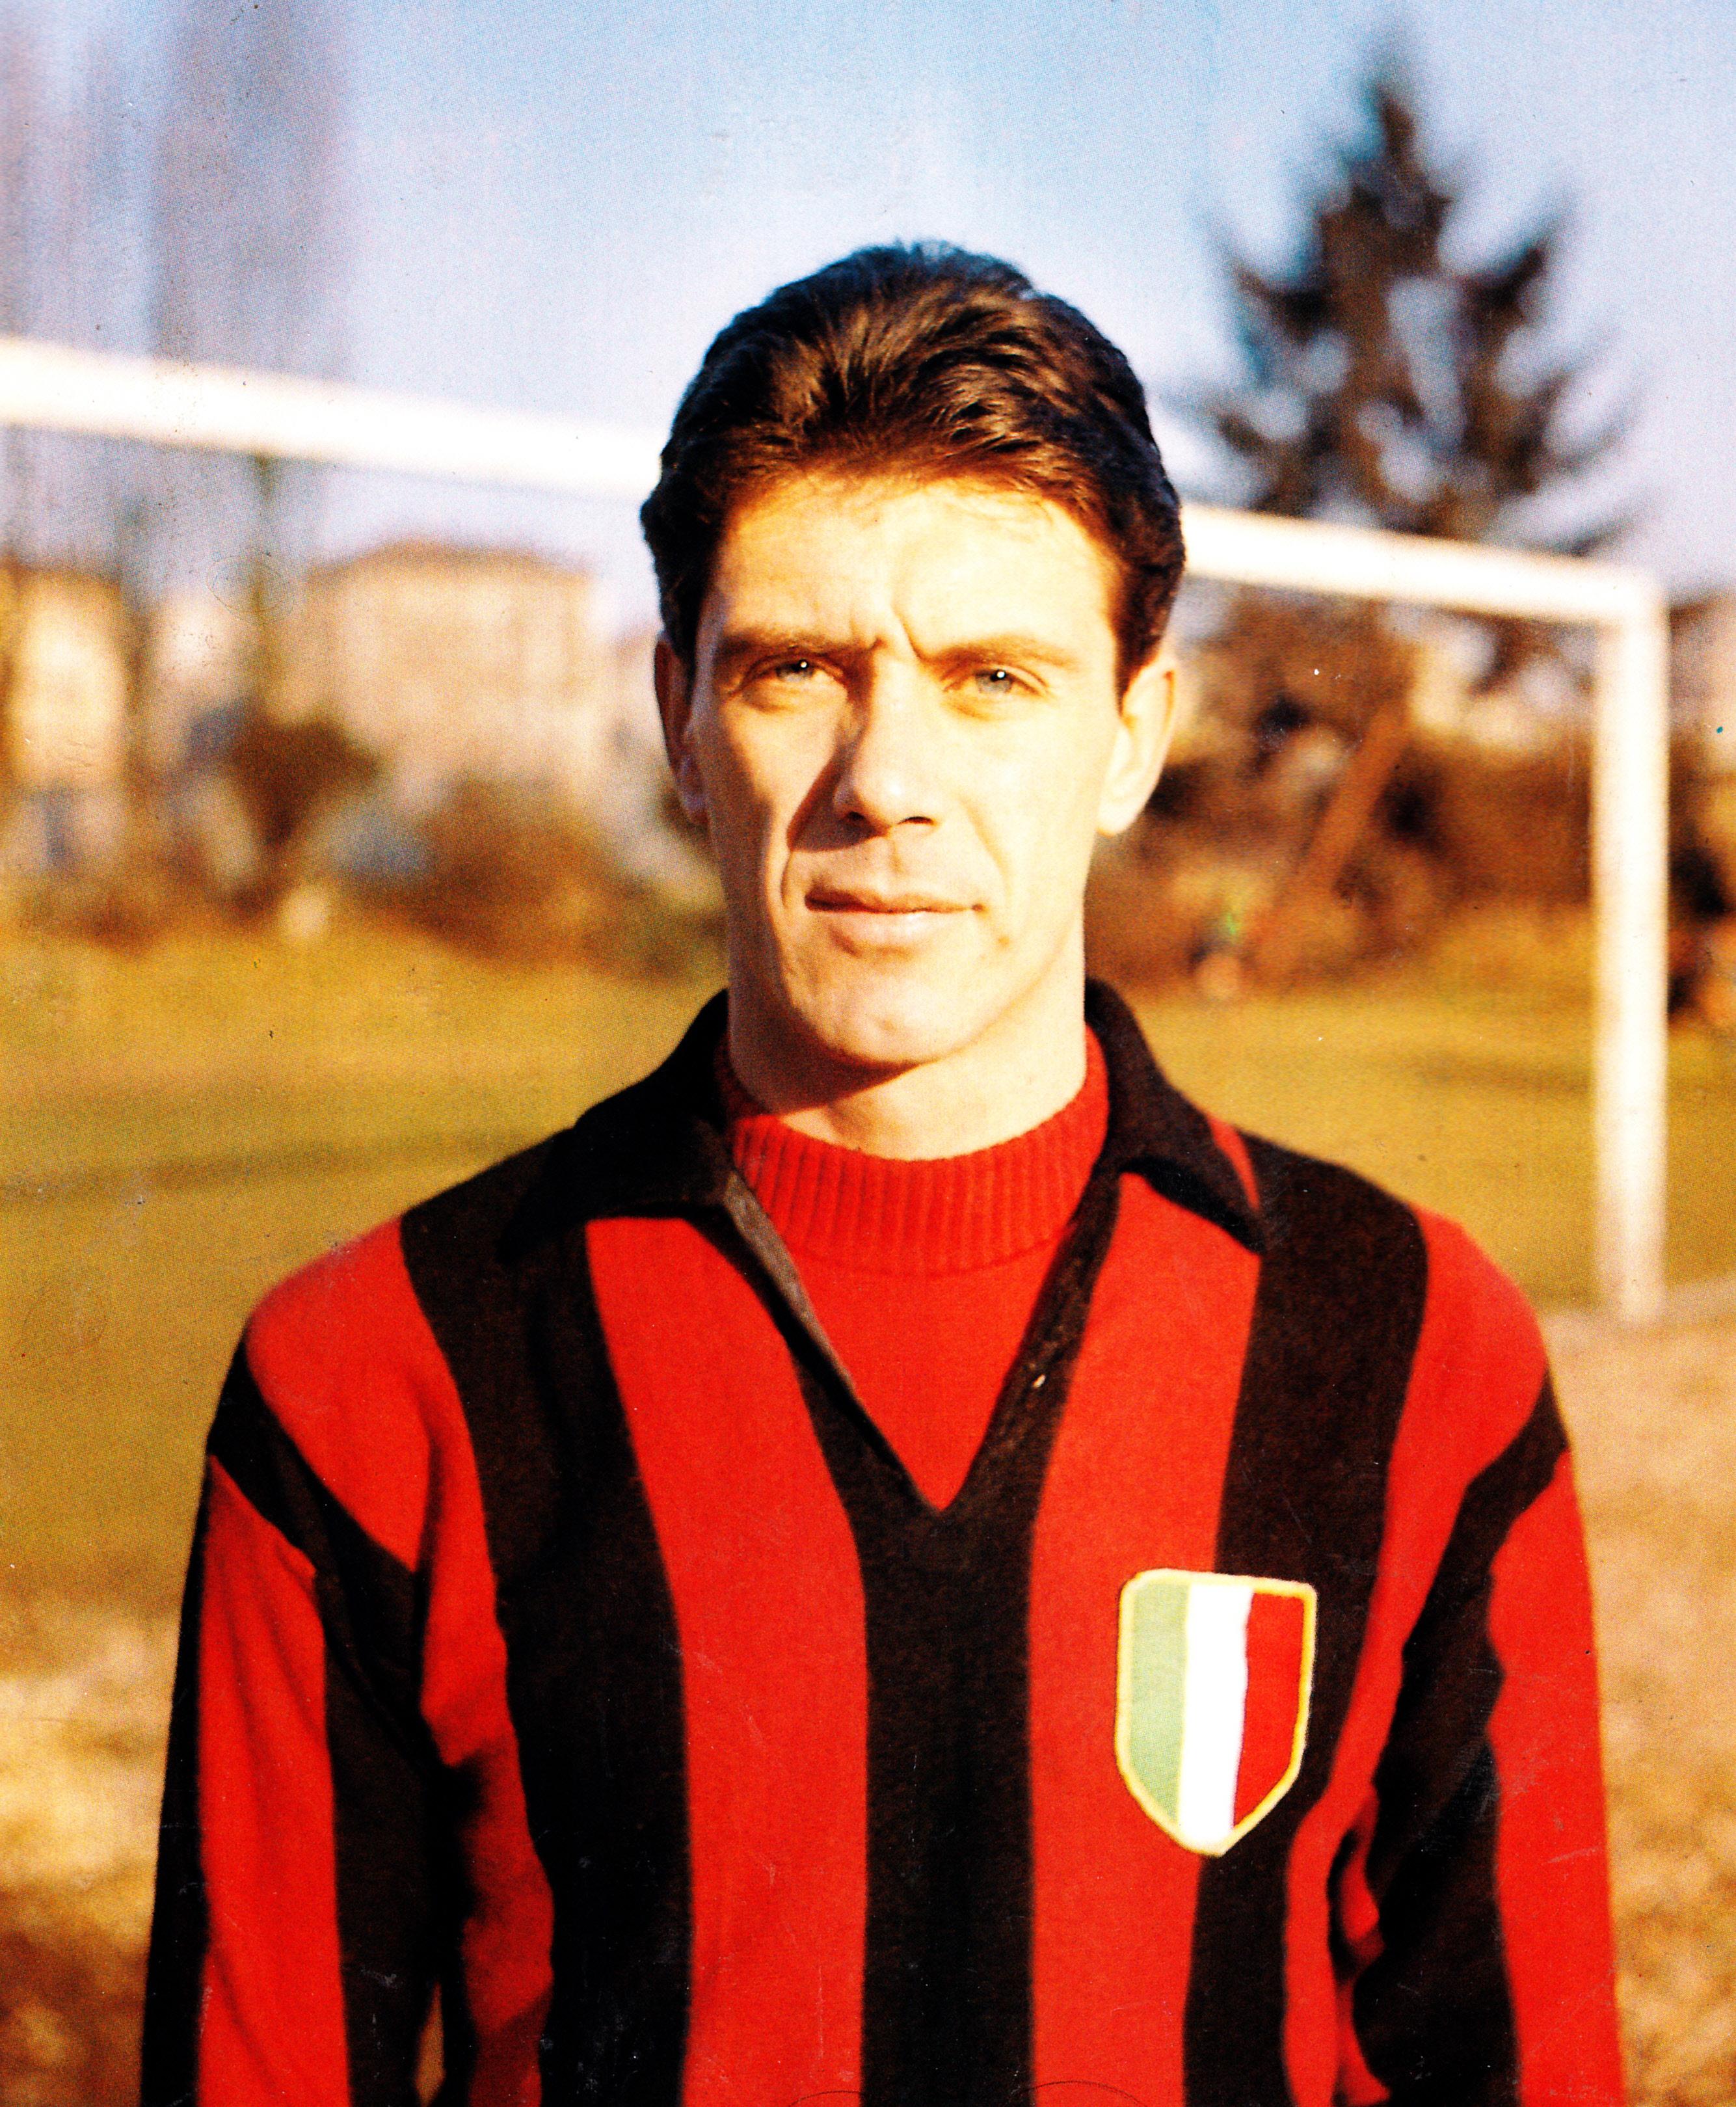 File:Cesare Maldini - AC Milan.jpg - Wikimedia Commons